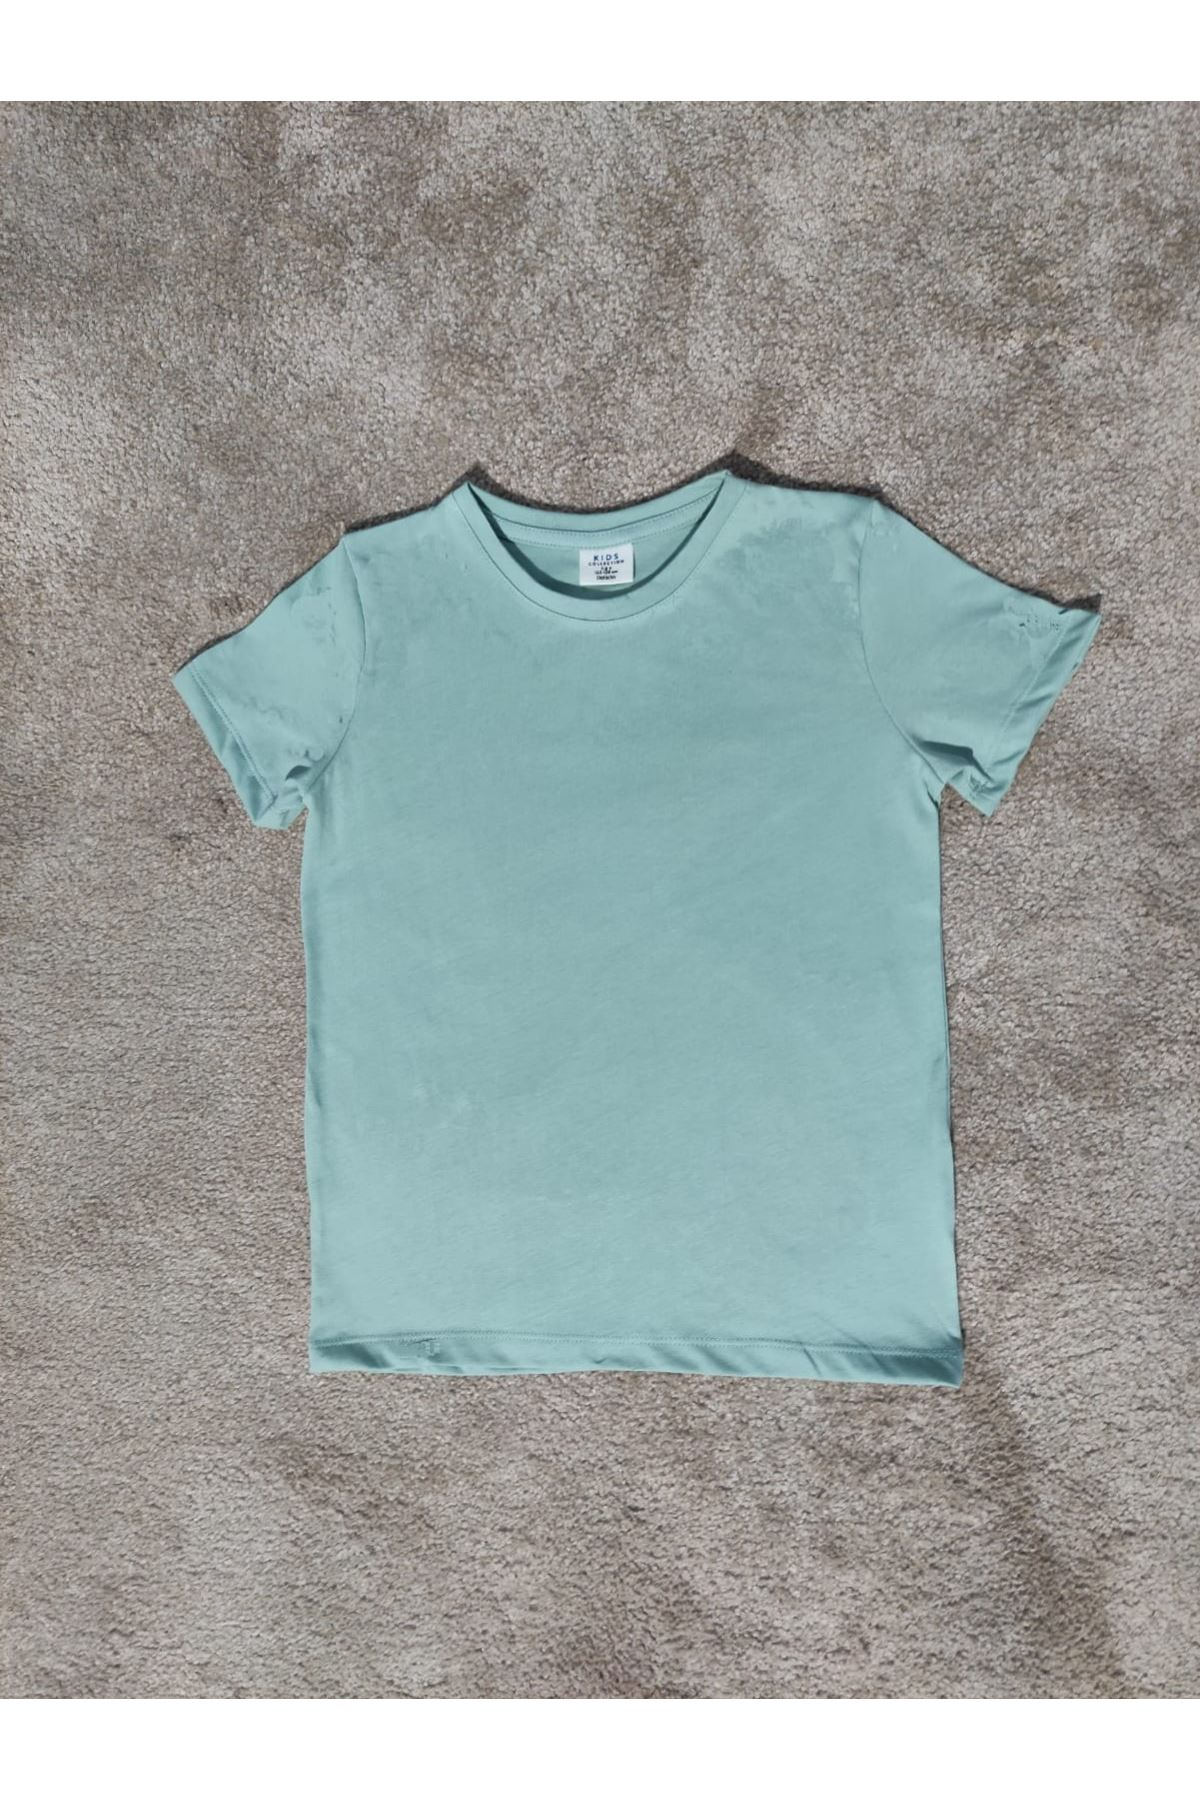 Kız Çocuk Bisiklet Yaka Mint T-shirt